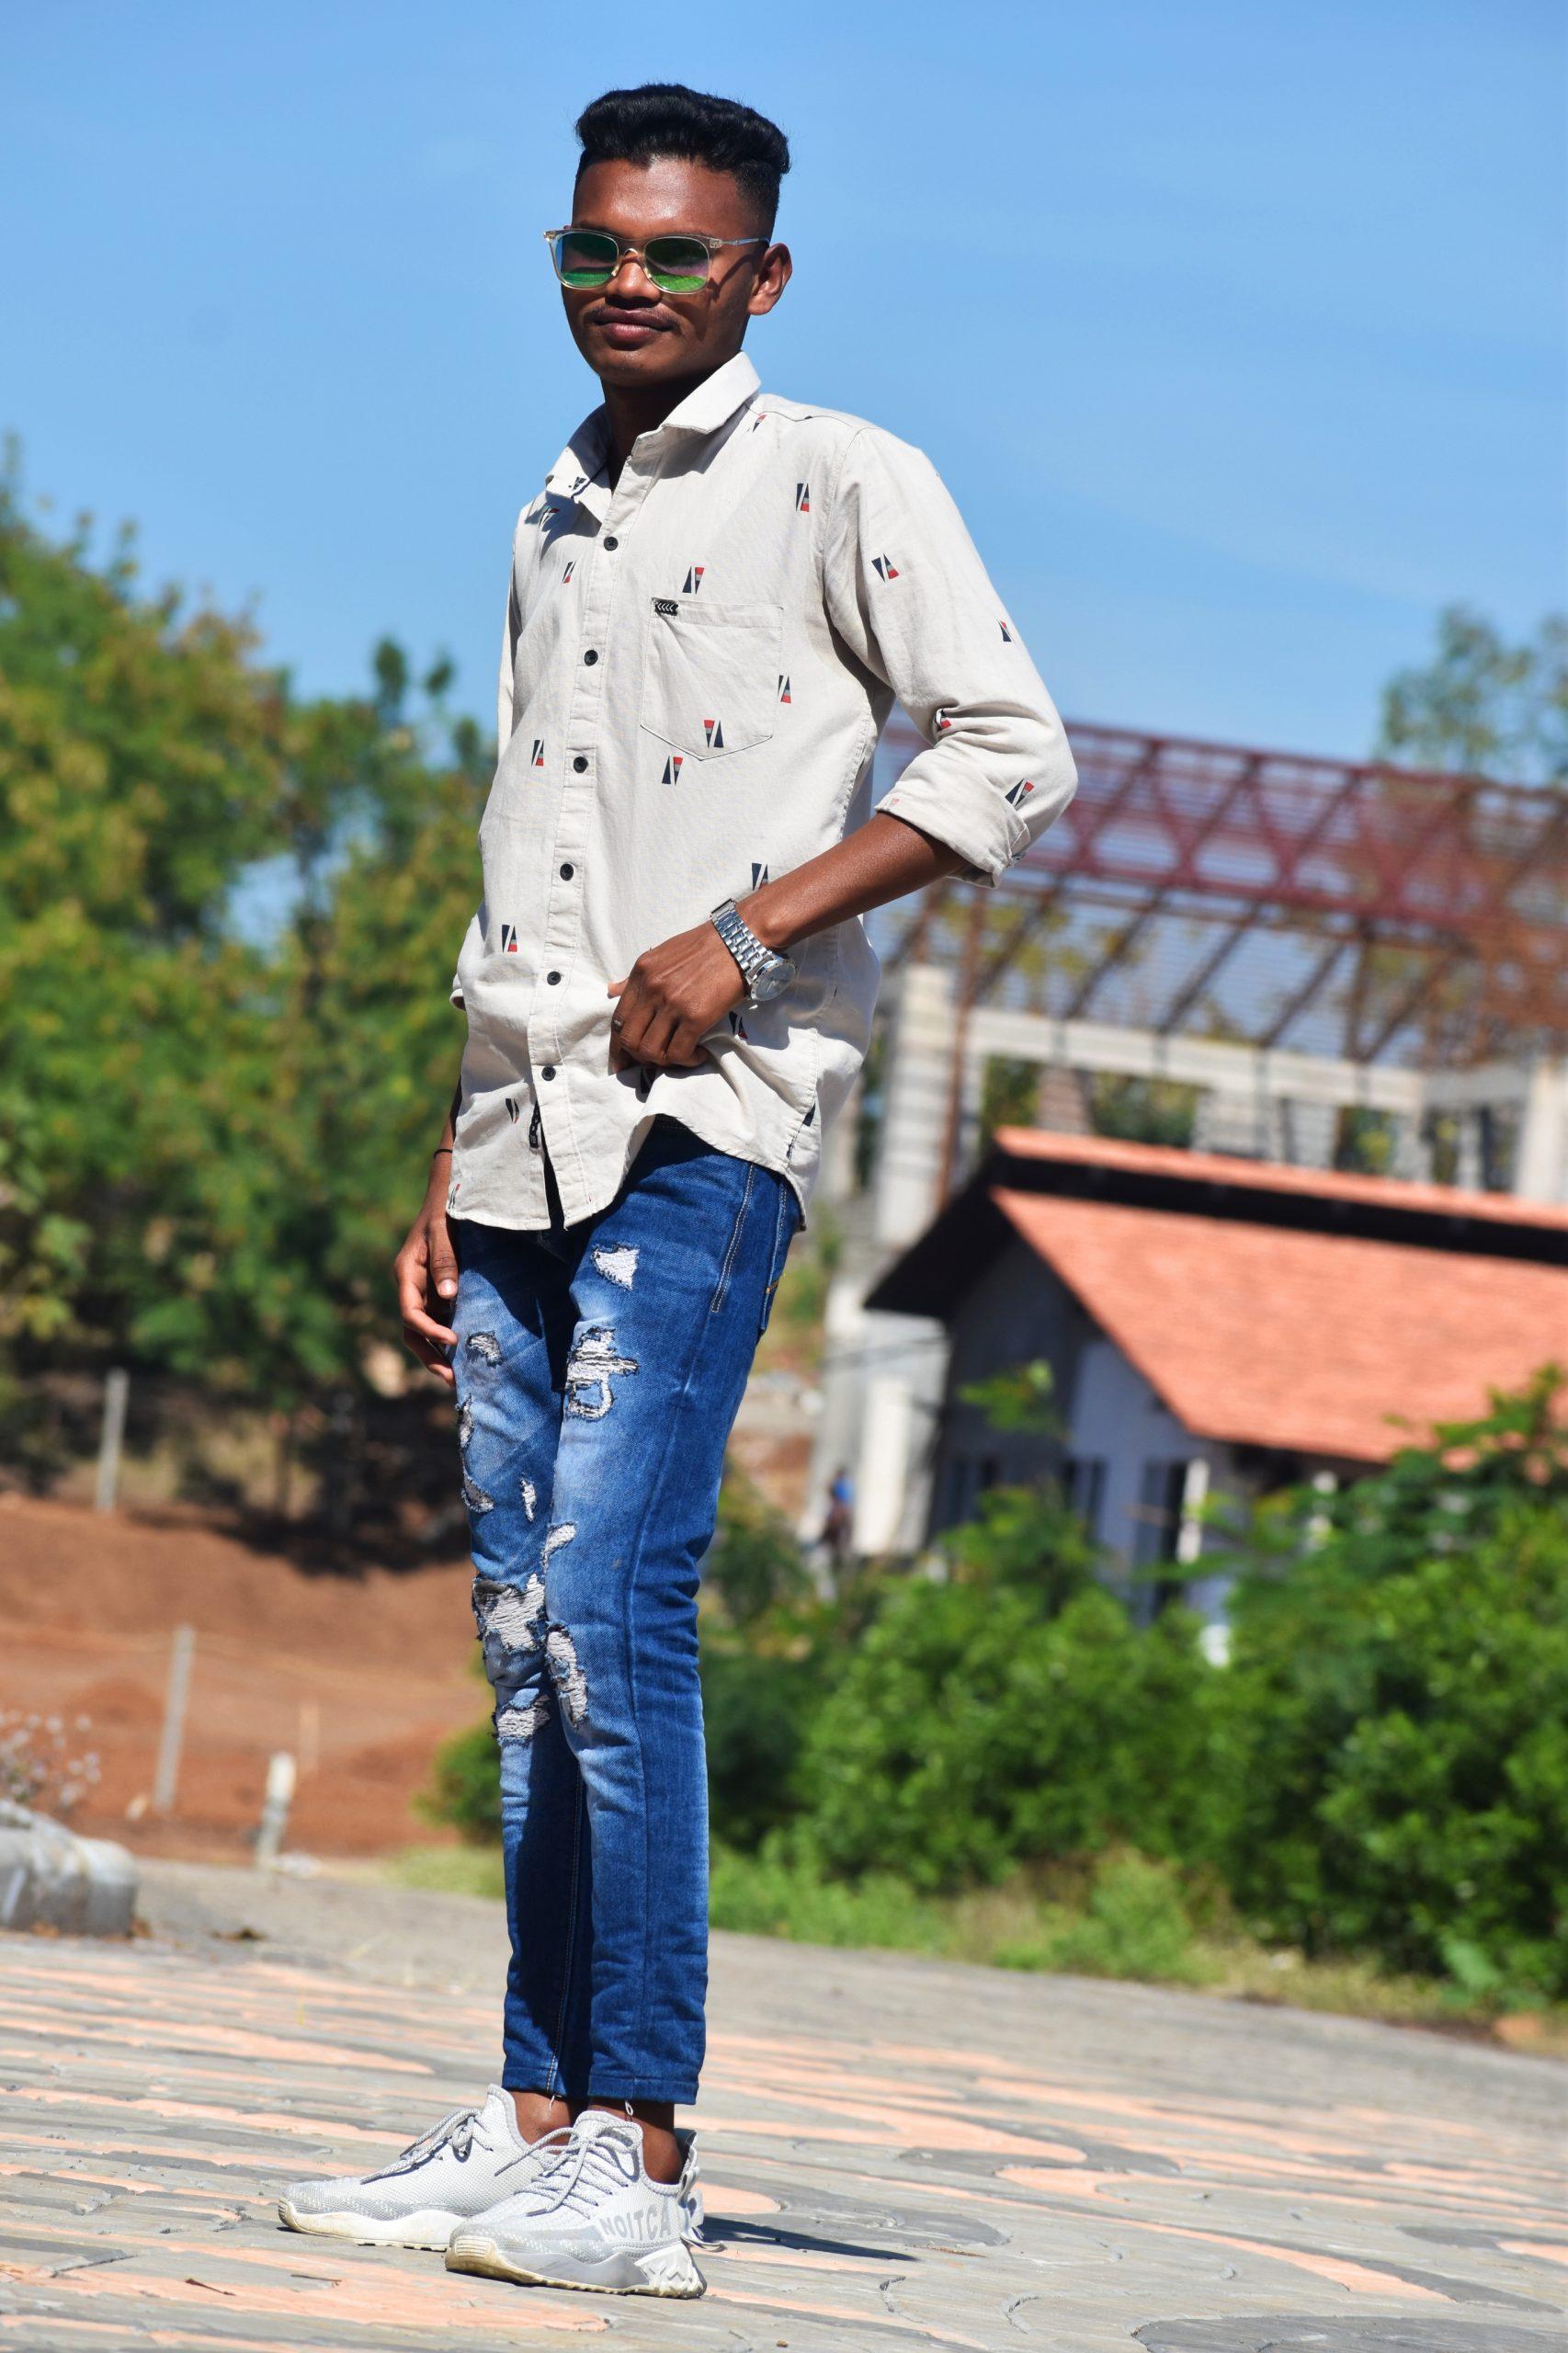 Stylish Boy posing in the garden